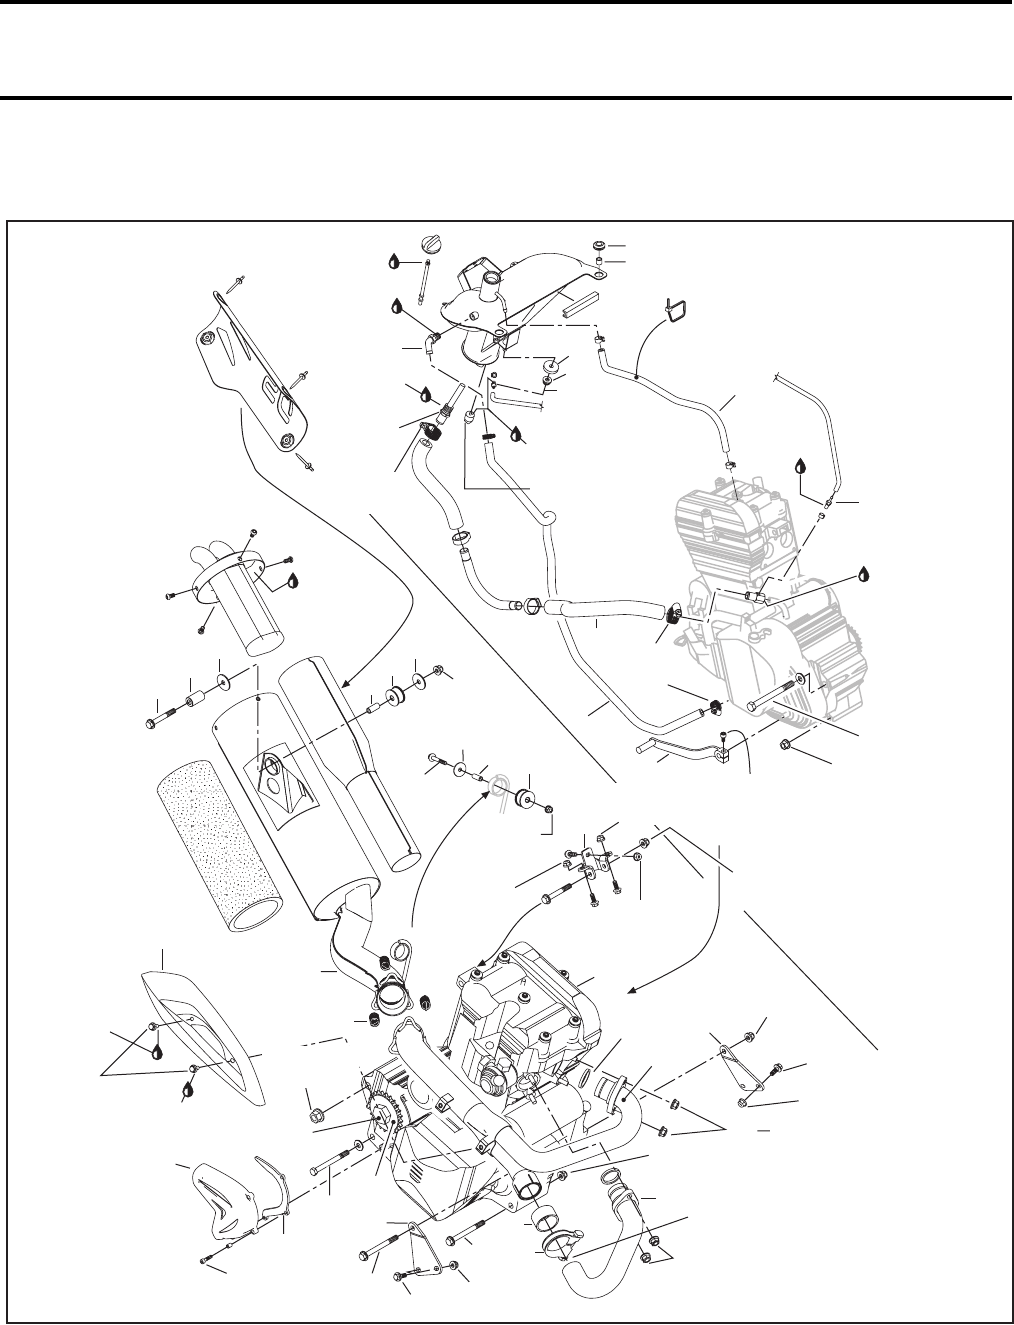 BOMBARDIER ATV DS 650 BAJA X (2004) SHOP MANUAL ENG